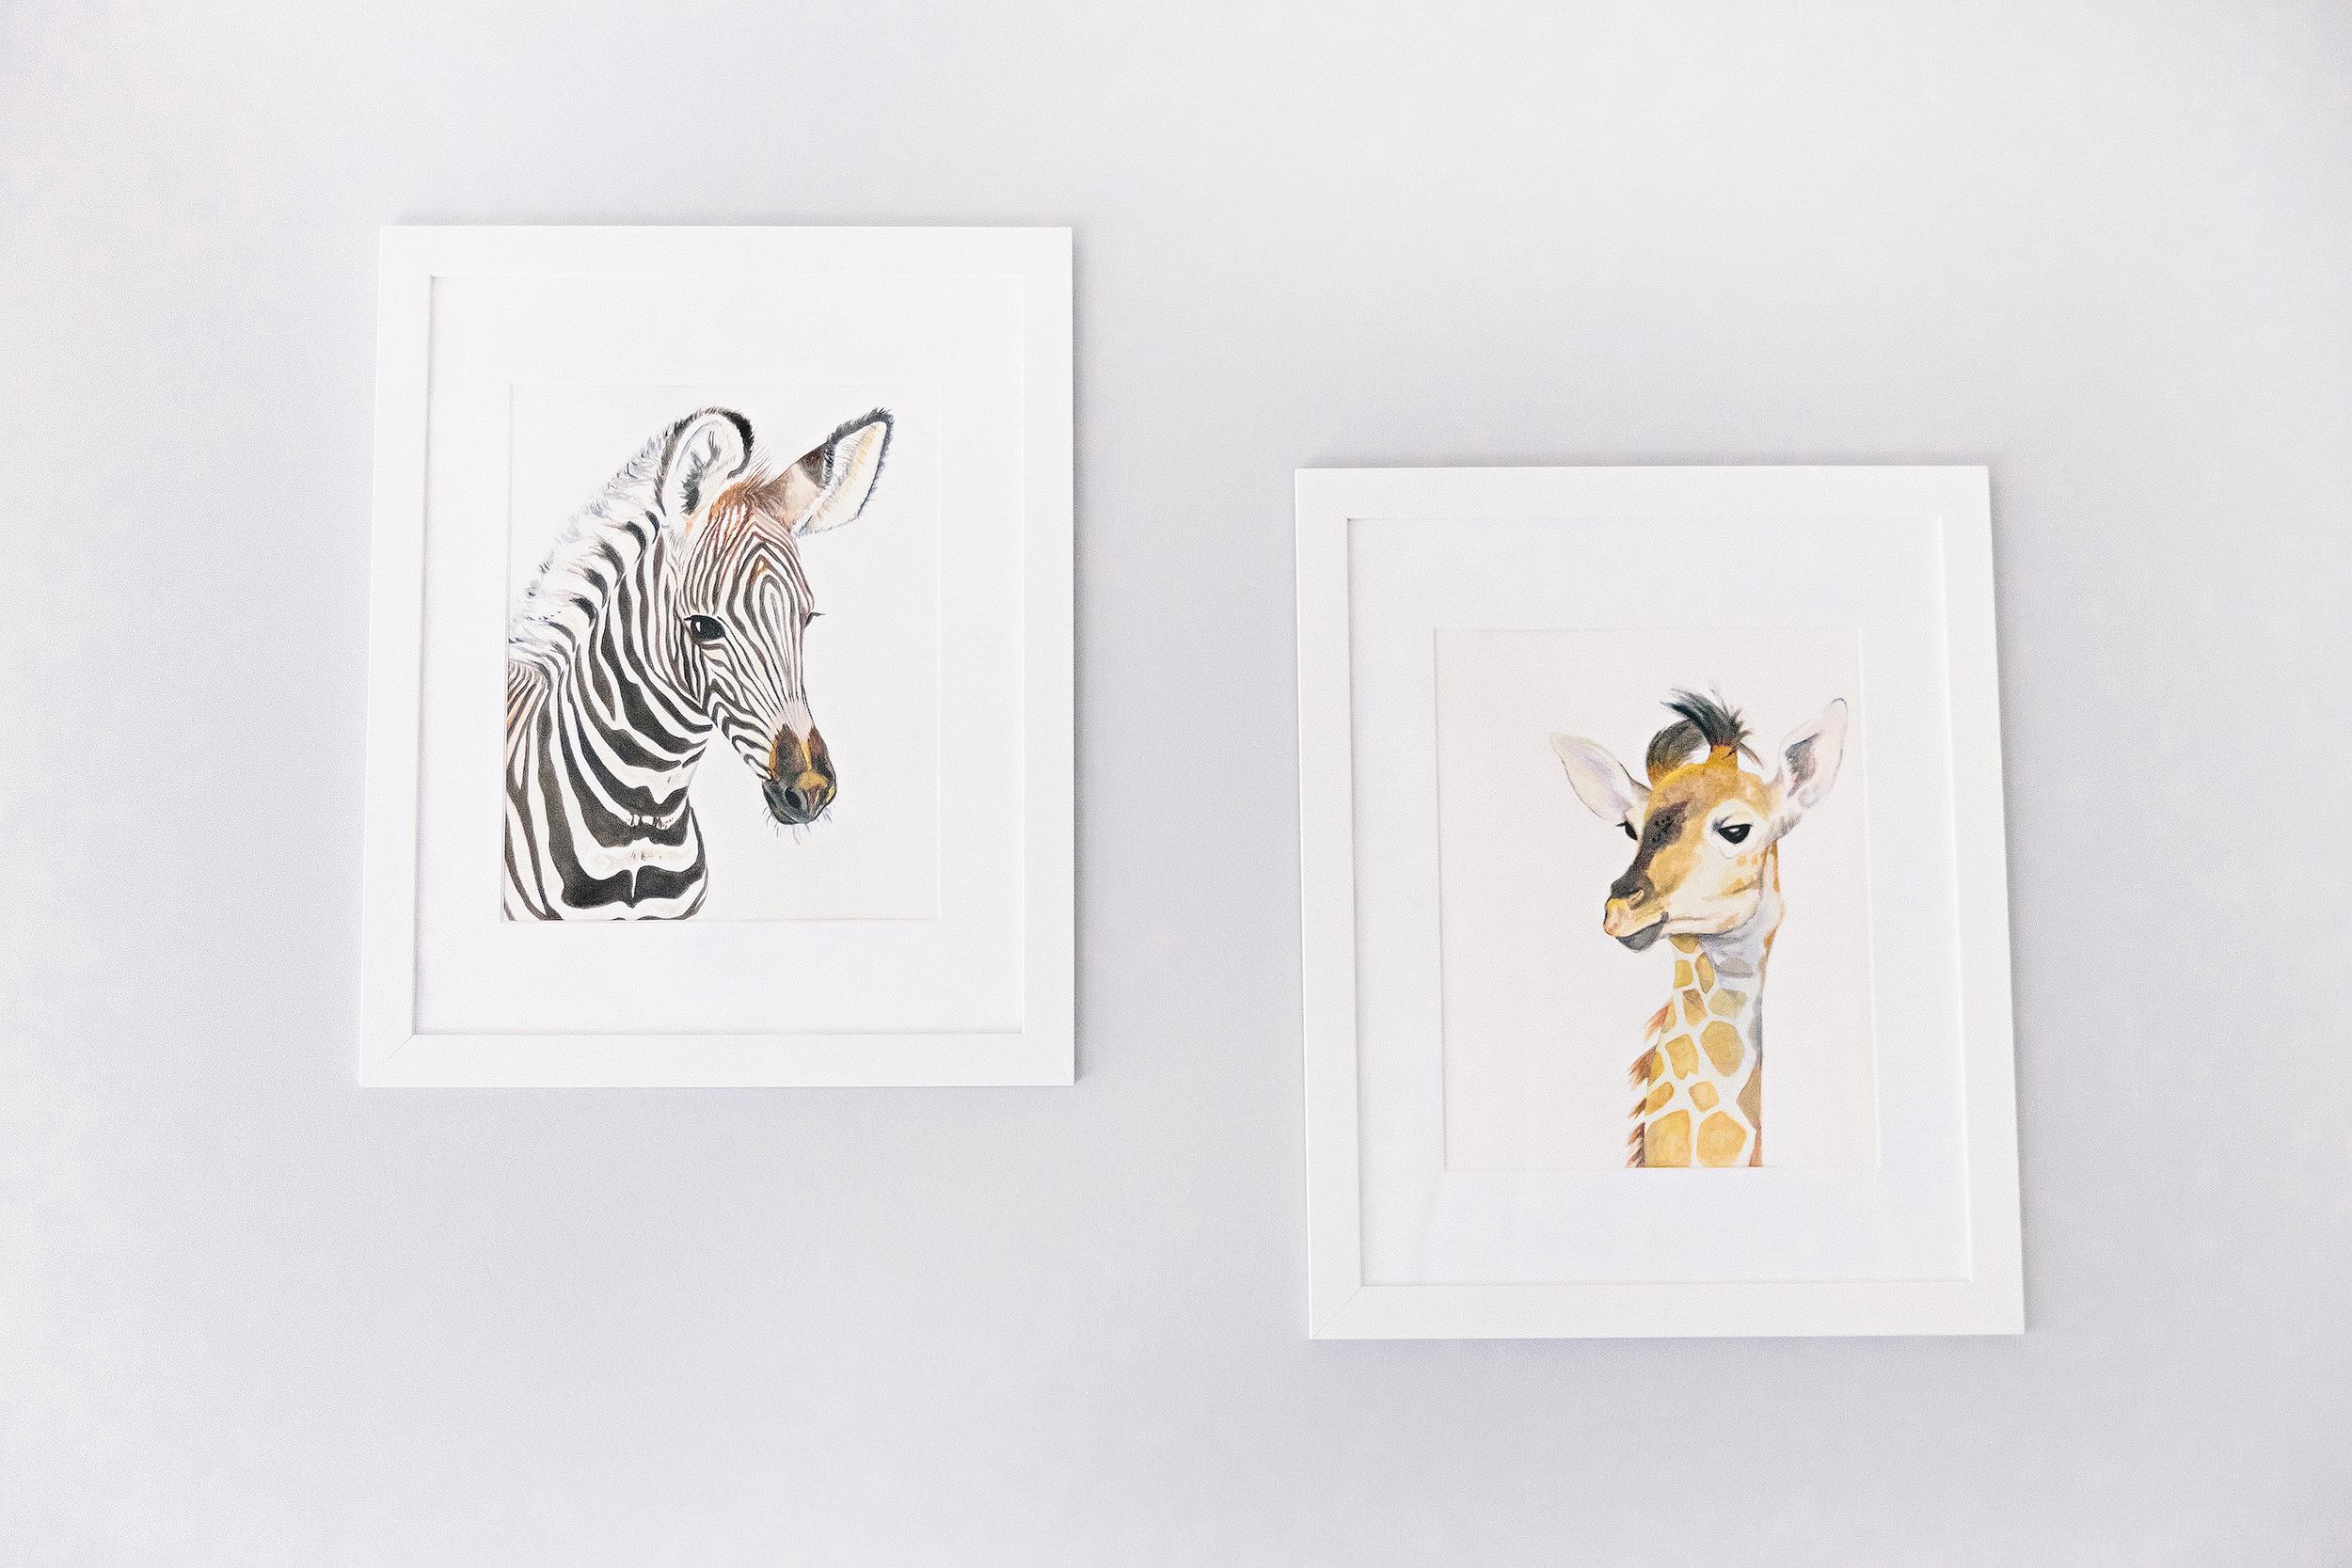 Zebra & Giraffe Baby Animal Nursery Art Prints | Photo by Cassie Schott Photography